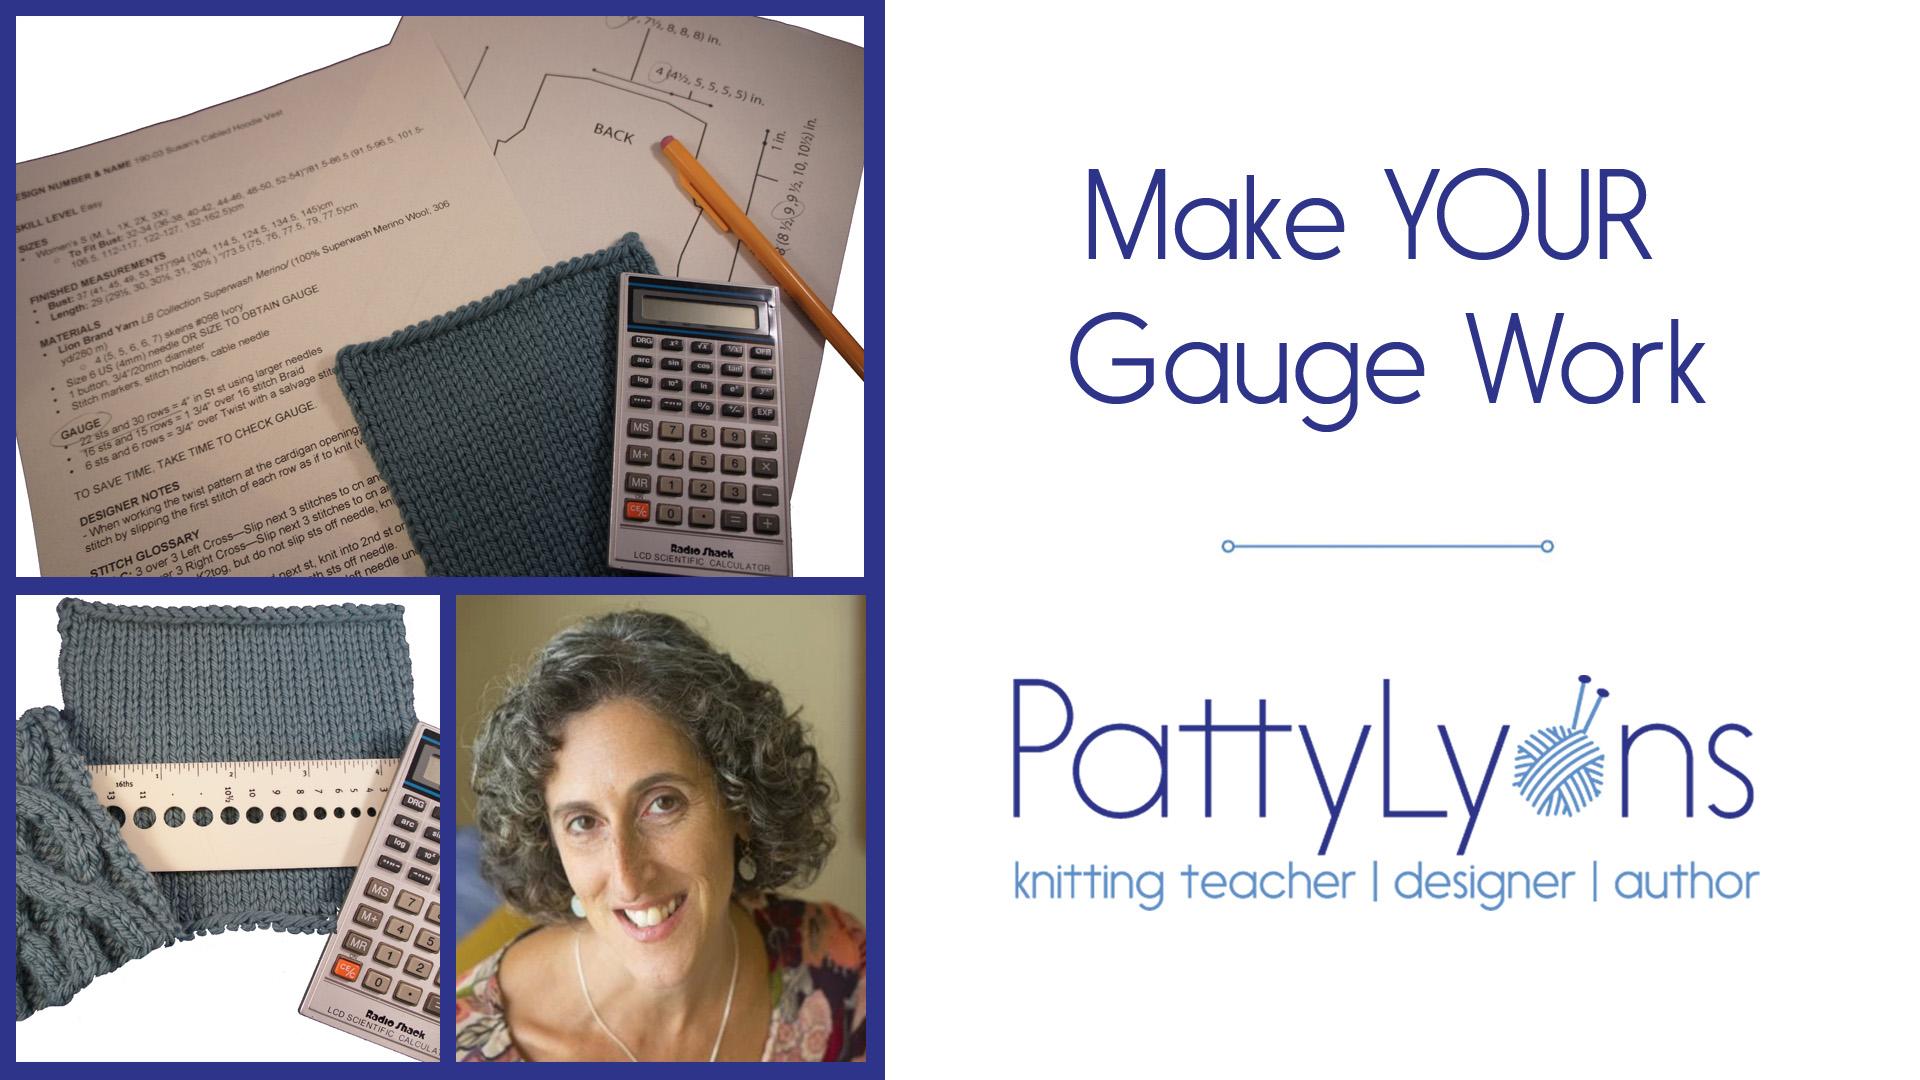 Make Your Gauge Work